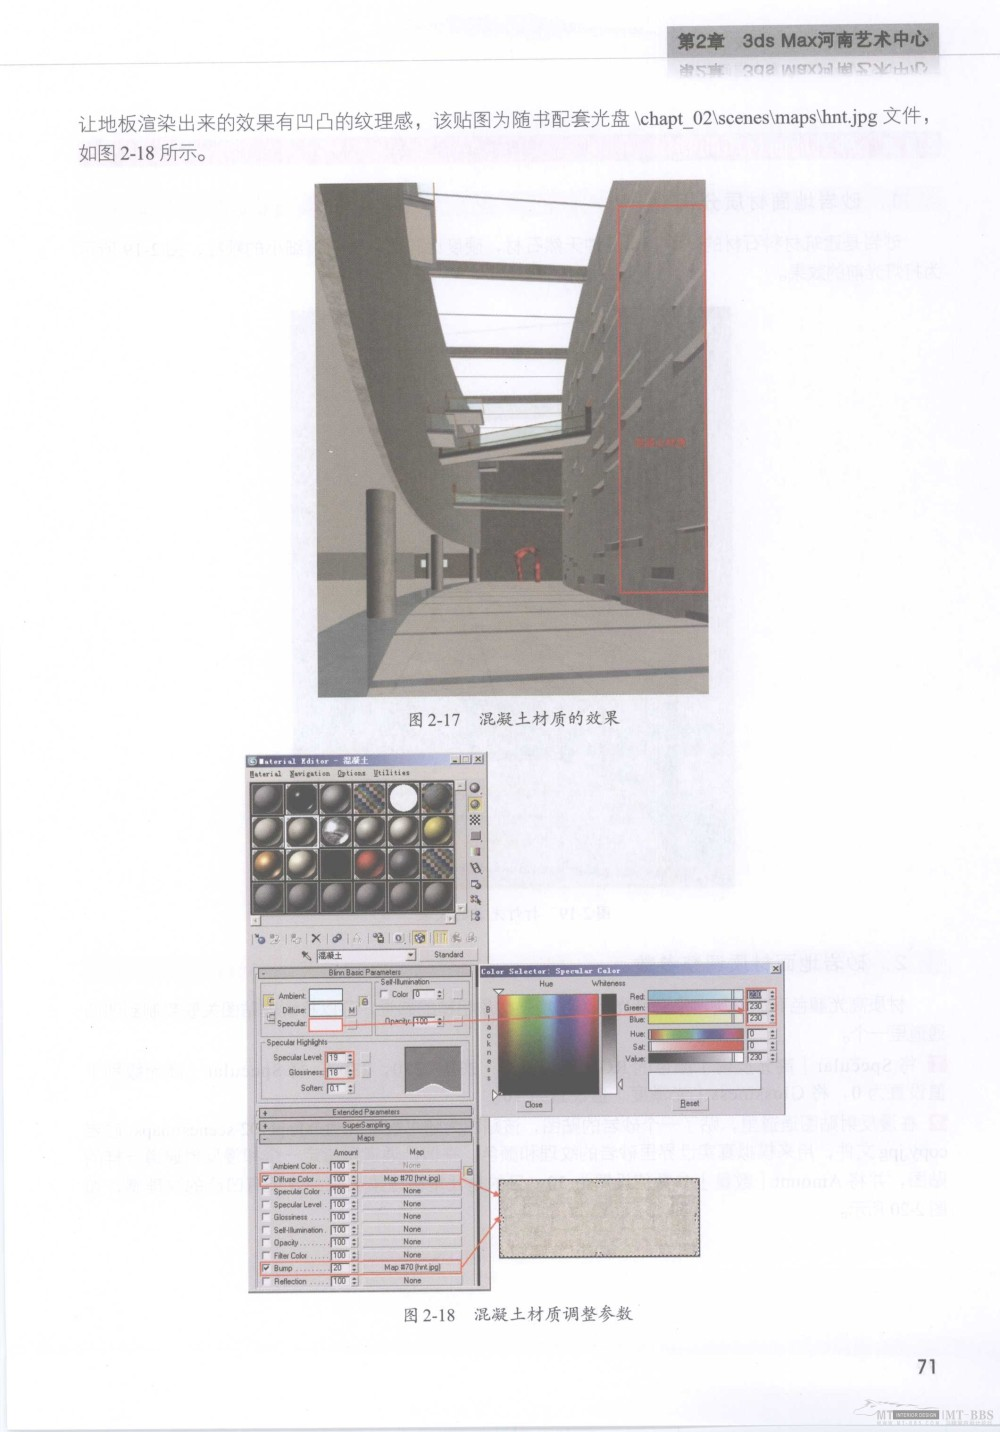 水晶石技法-3ds_Max&VRay室内空间表现_水晶石技法-3ds_Max&VRay室内空间表现_页面_077.jpg